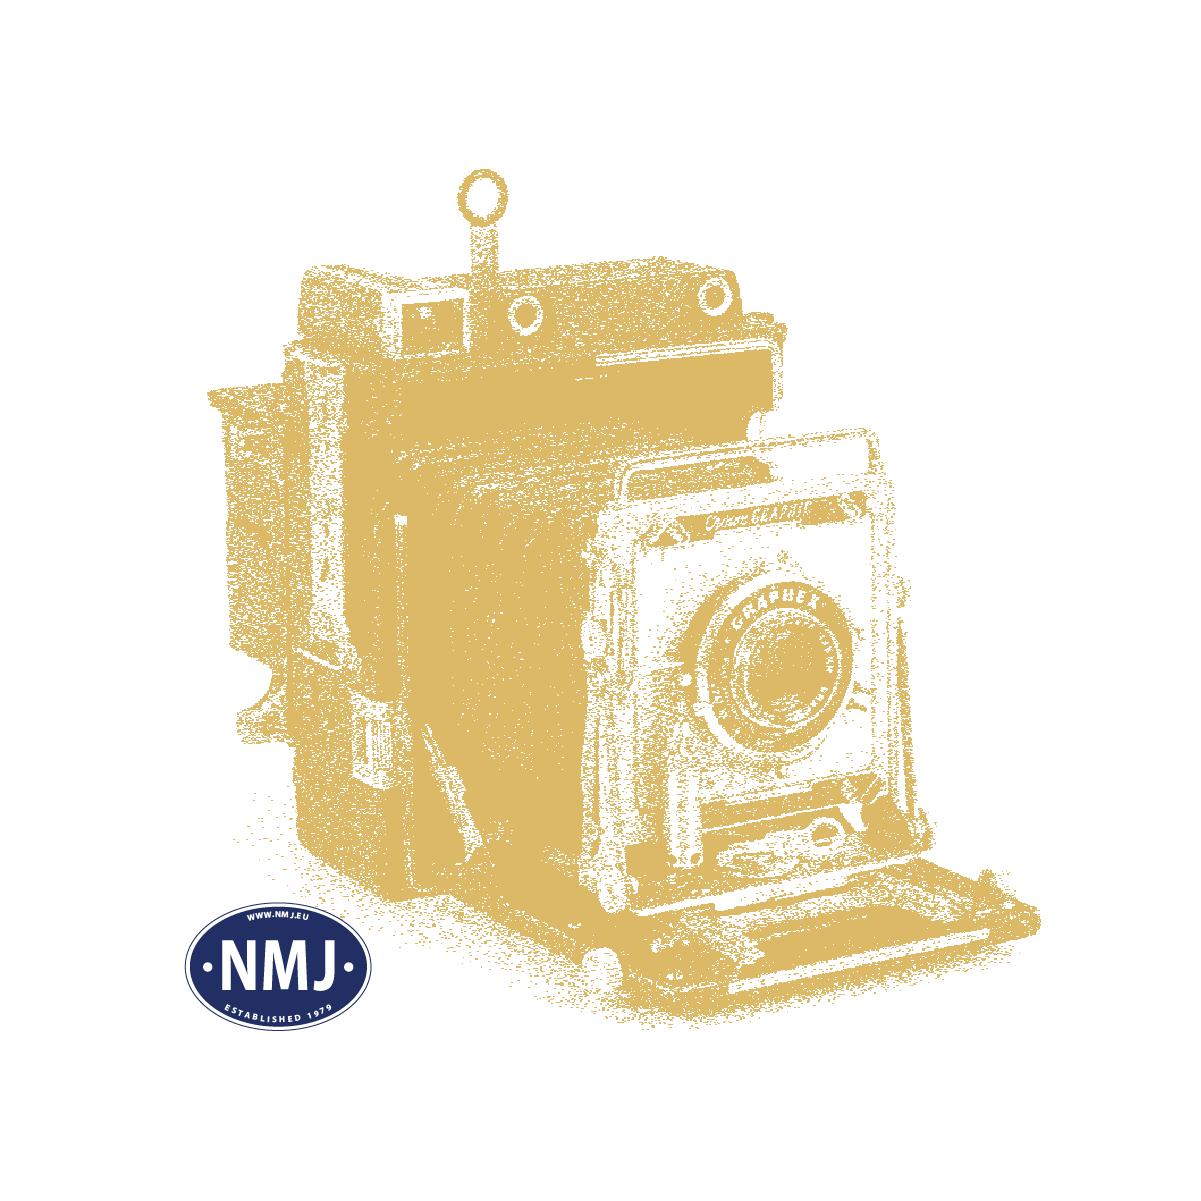 NMJT136.402 - NMJ Topline OFOTBANEN OBAS CB2 21227 Northern Light logo